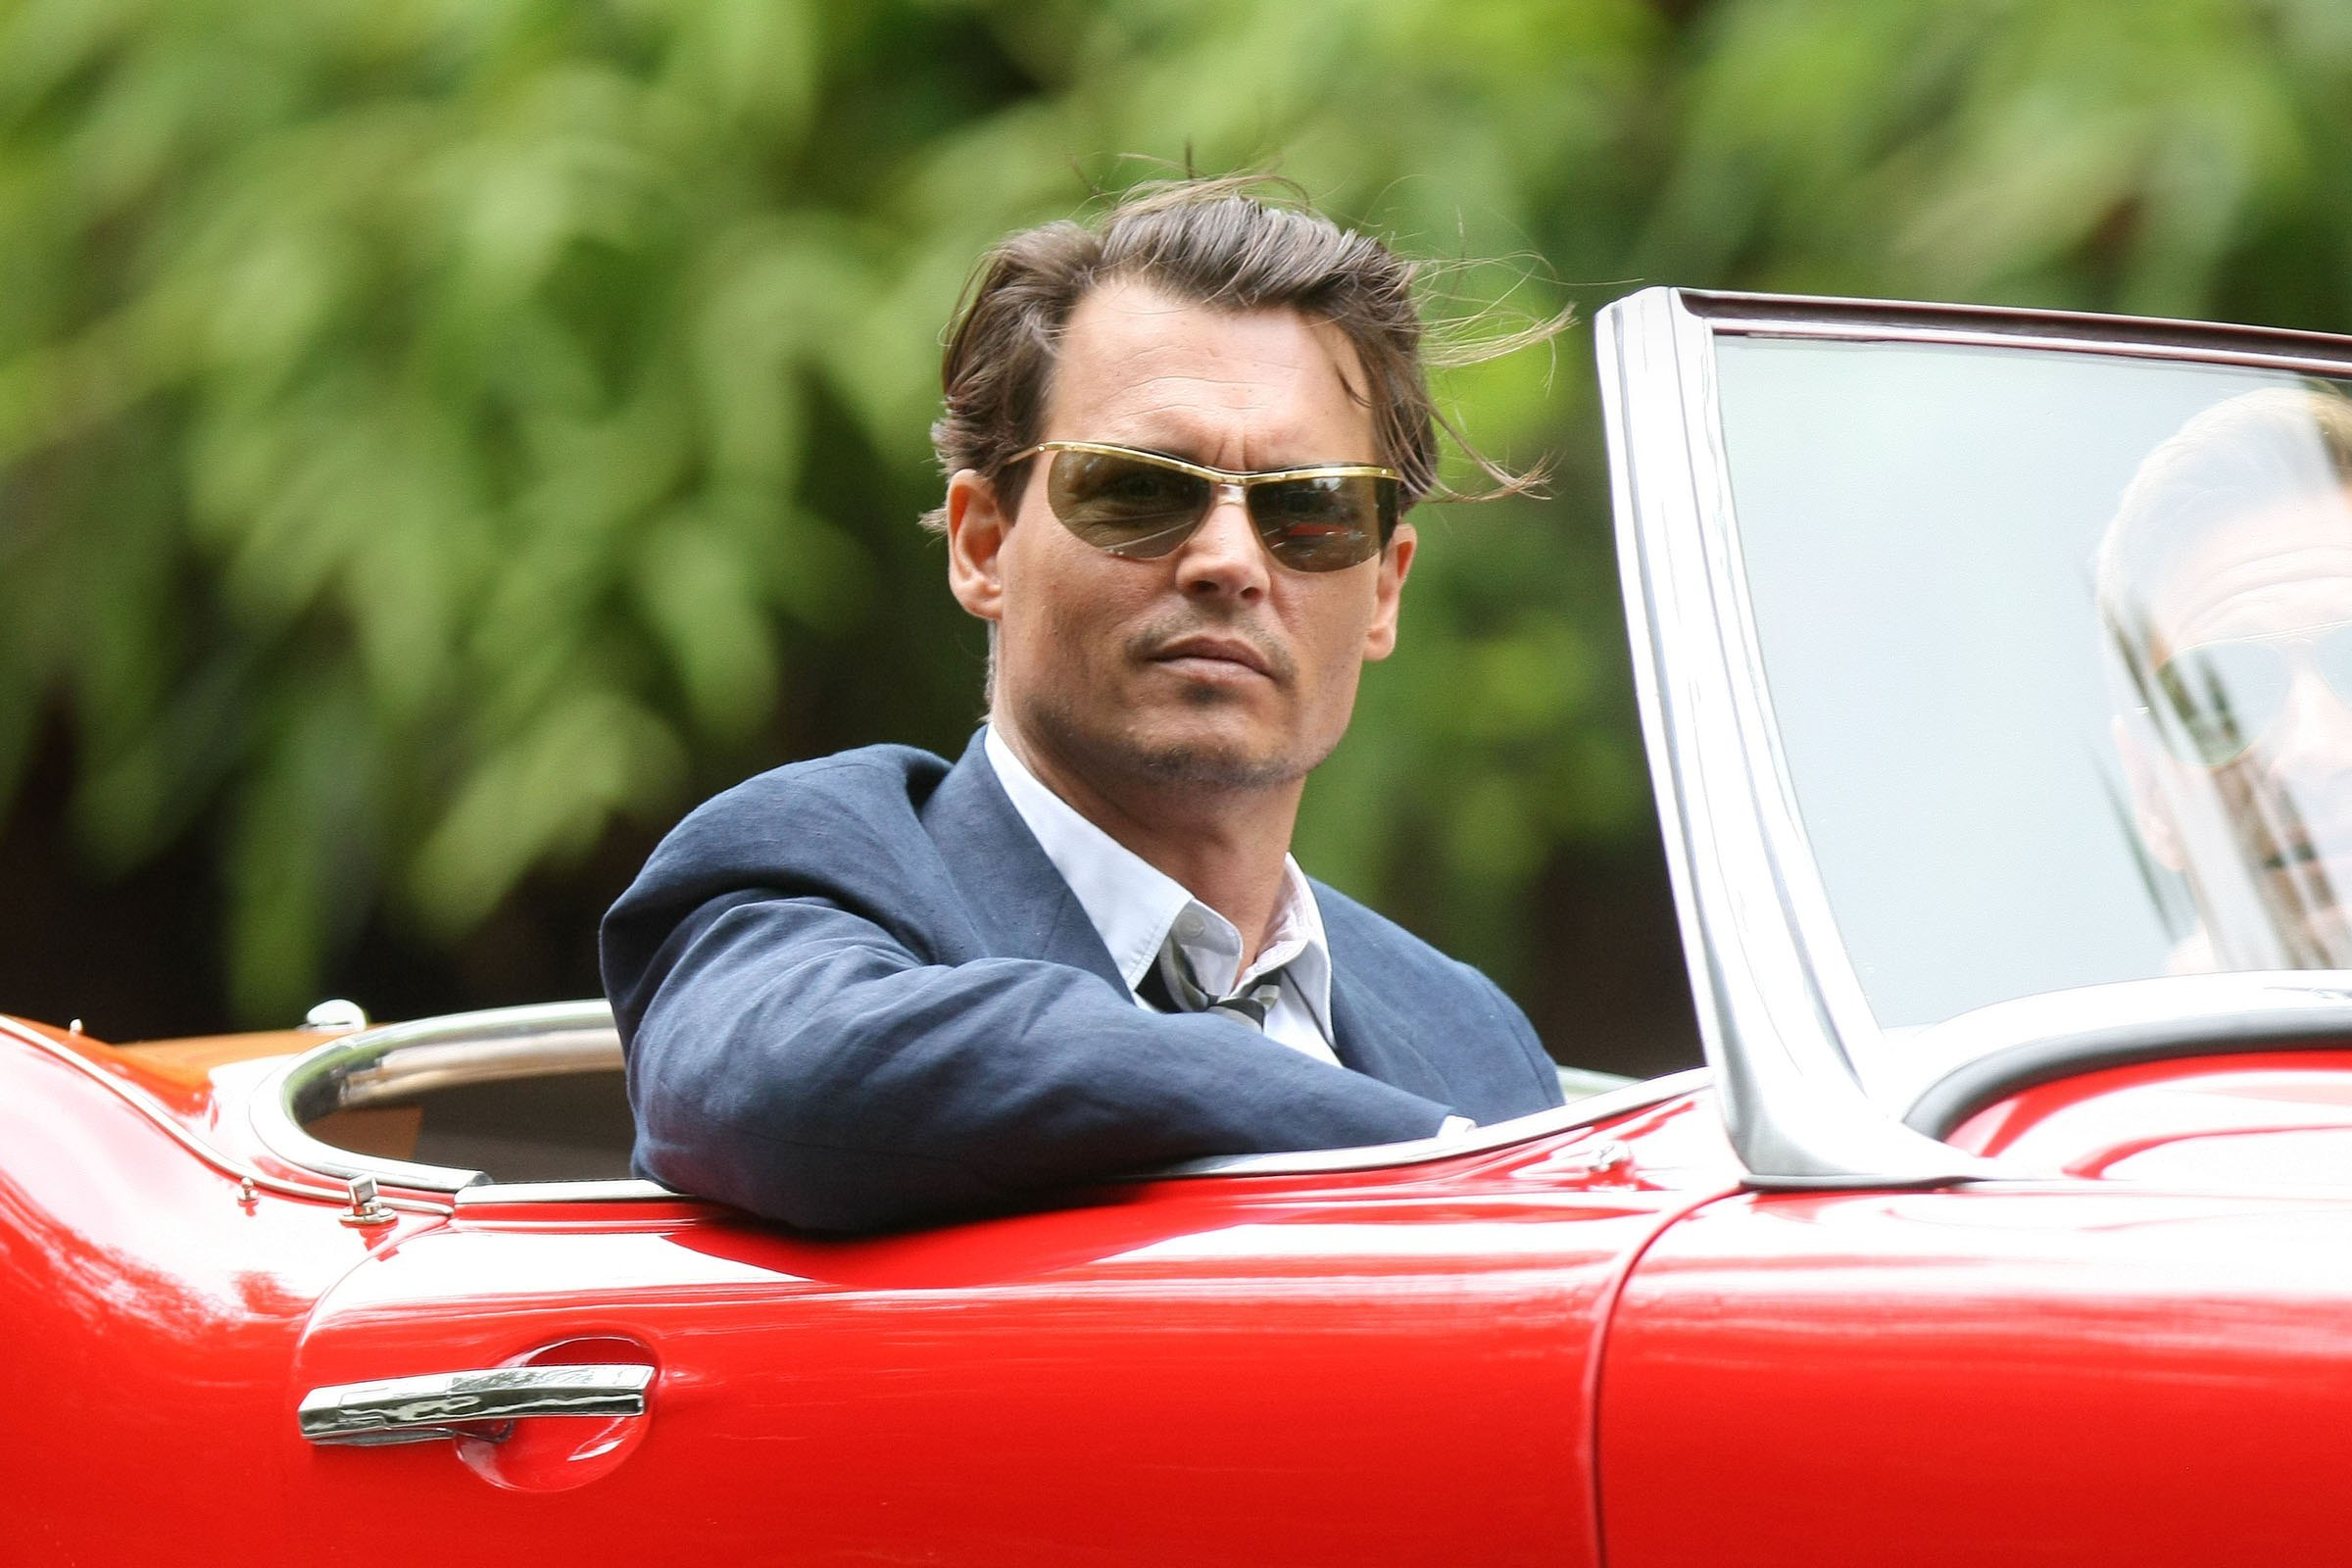 Johnny Depp Confirmed for 'Black Mass', Tom Hardy in Talks – /Film